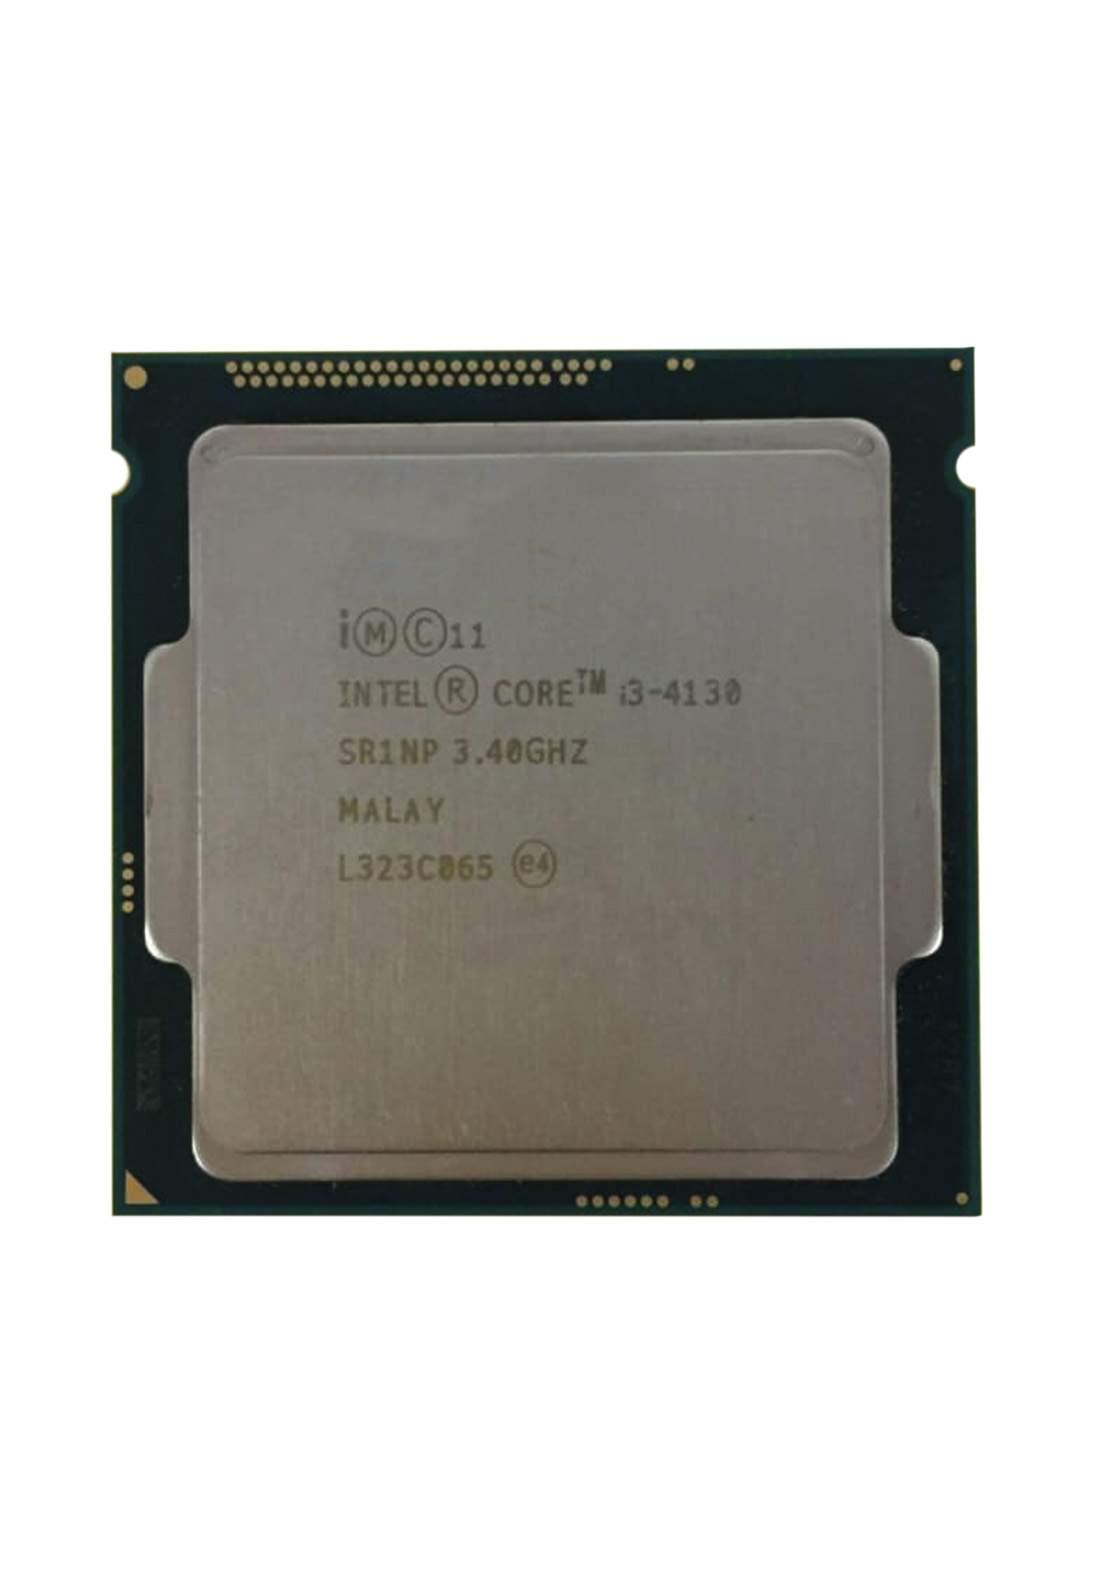 Intel Ci3 4130 CPU-Processor Tray معالج